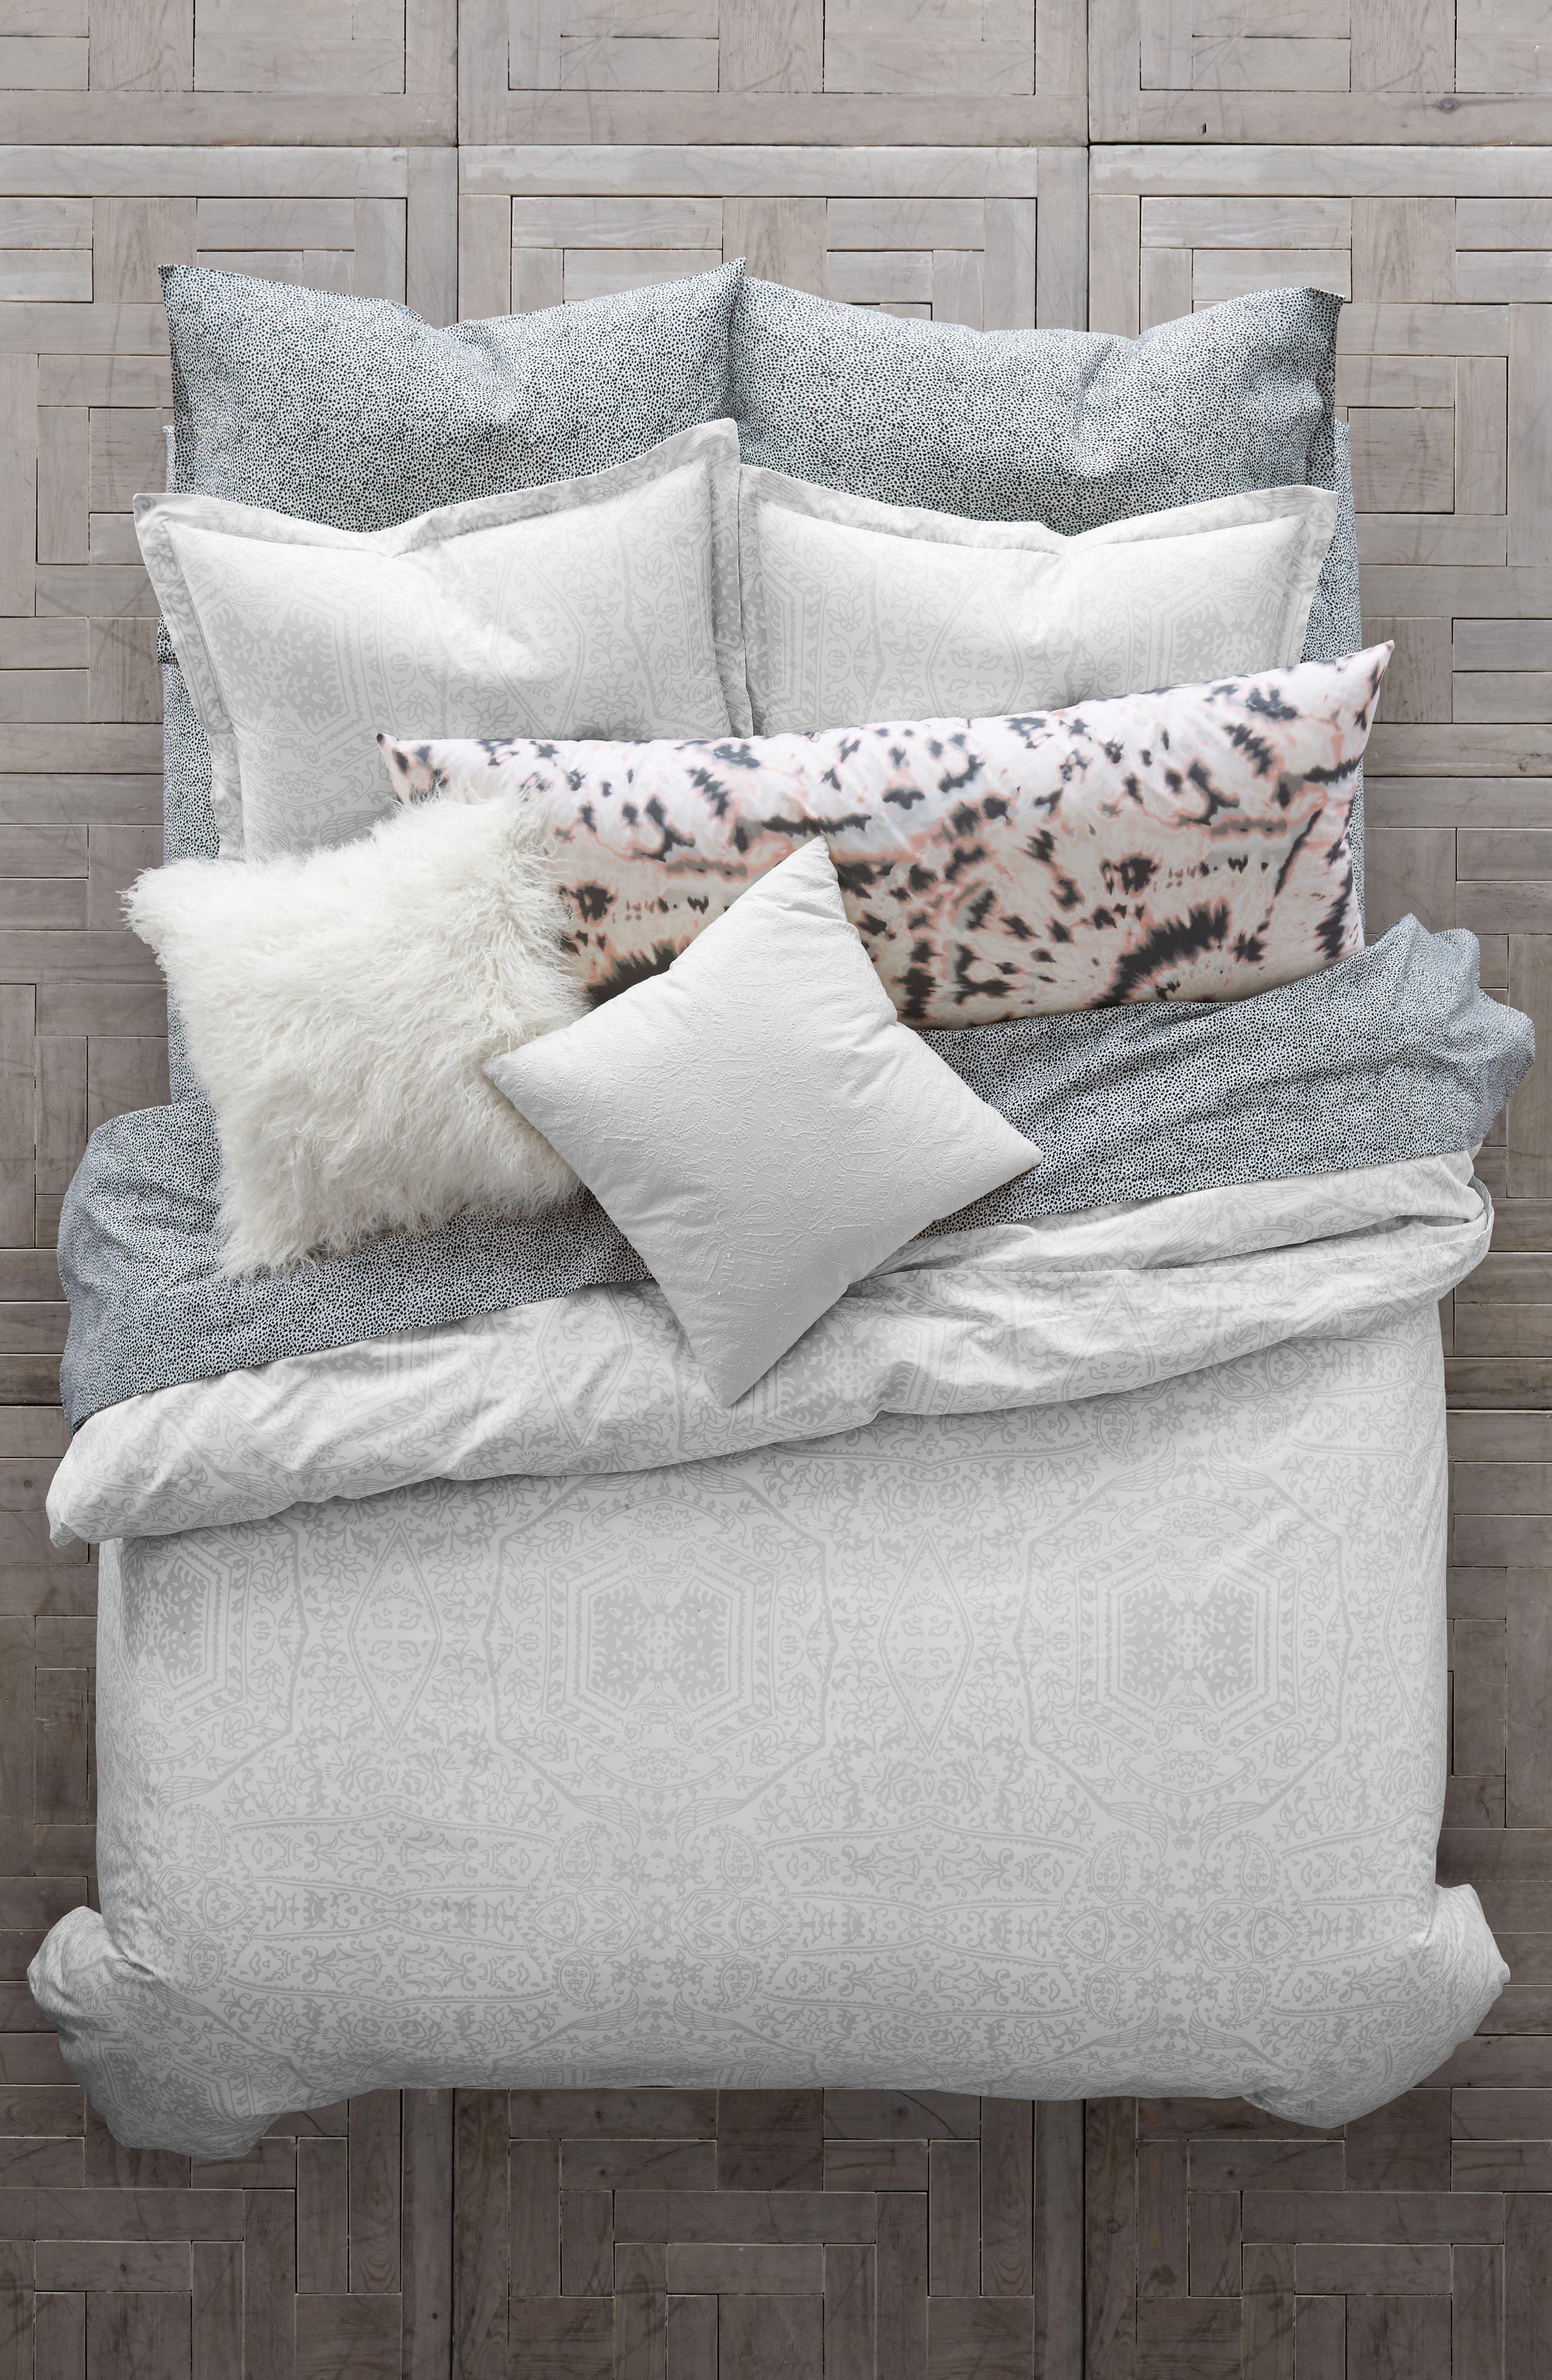 Main Image - BCBGeneration Chantilly Lace Comforter & Sham Set